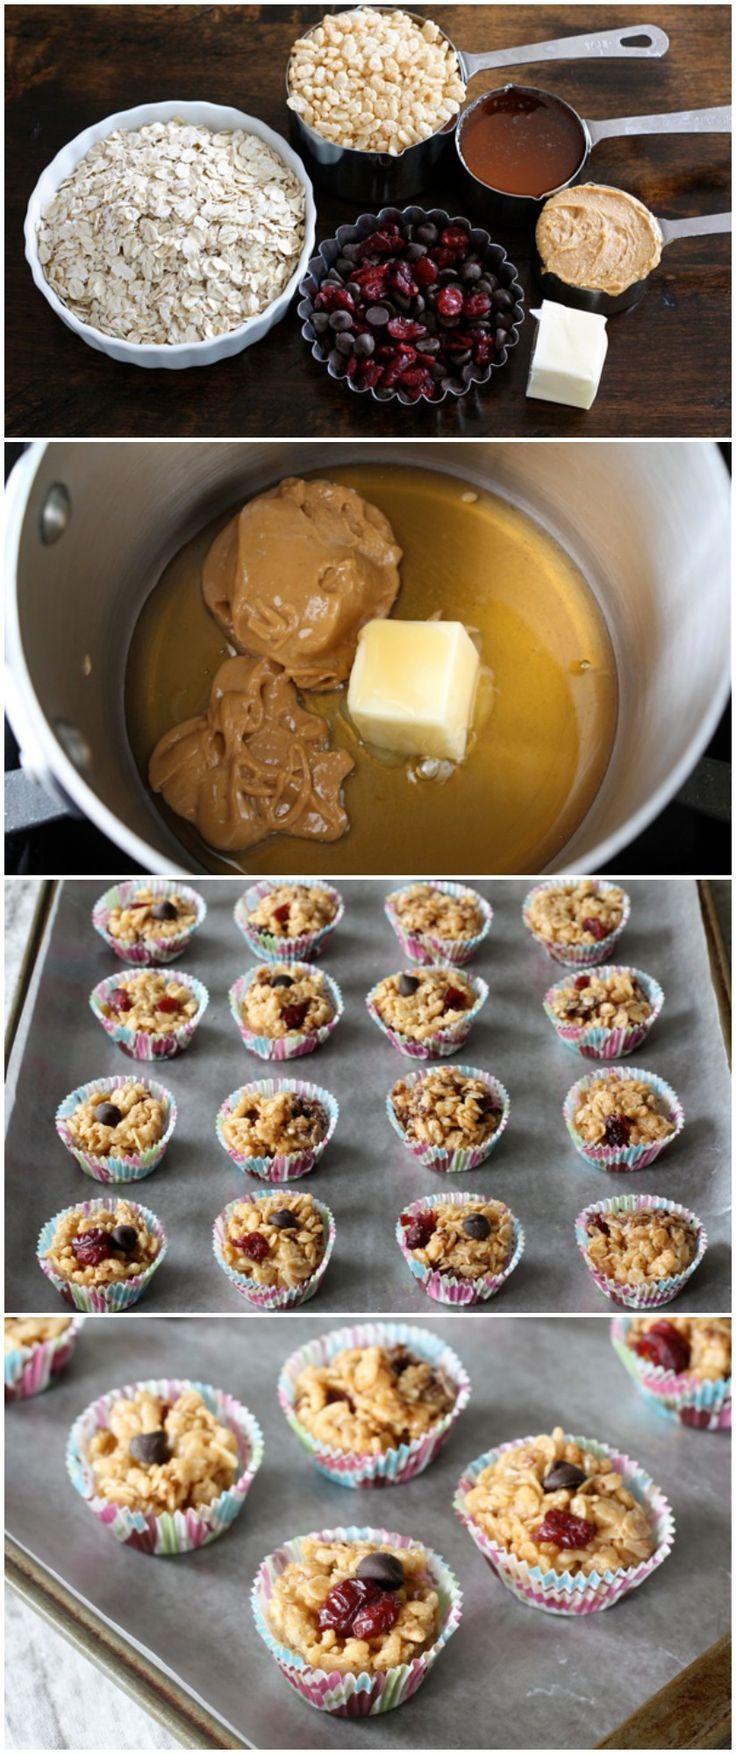 Peanut Butter Granola Balls Recipe on twopeasandtheirpod.com Love these easy no-bake treats!